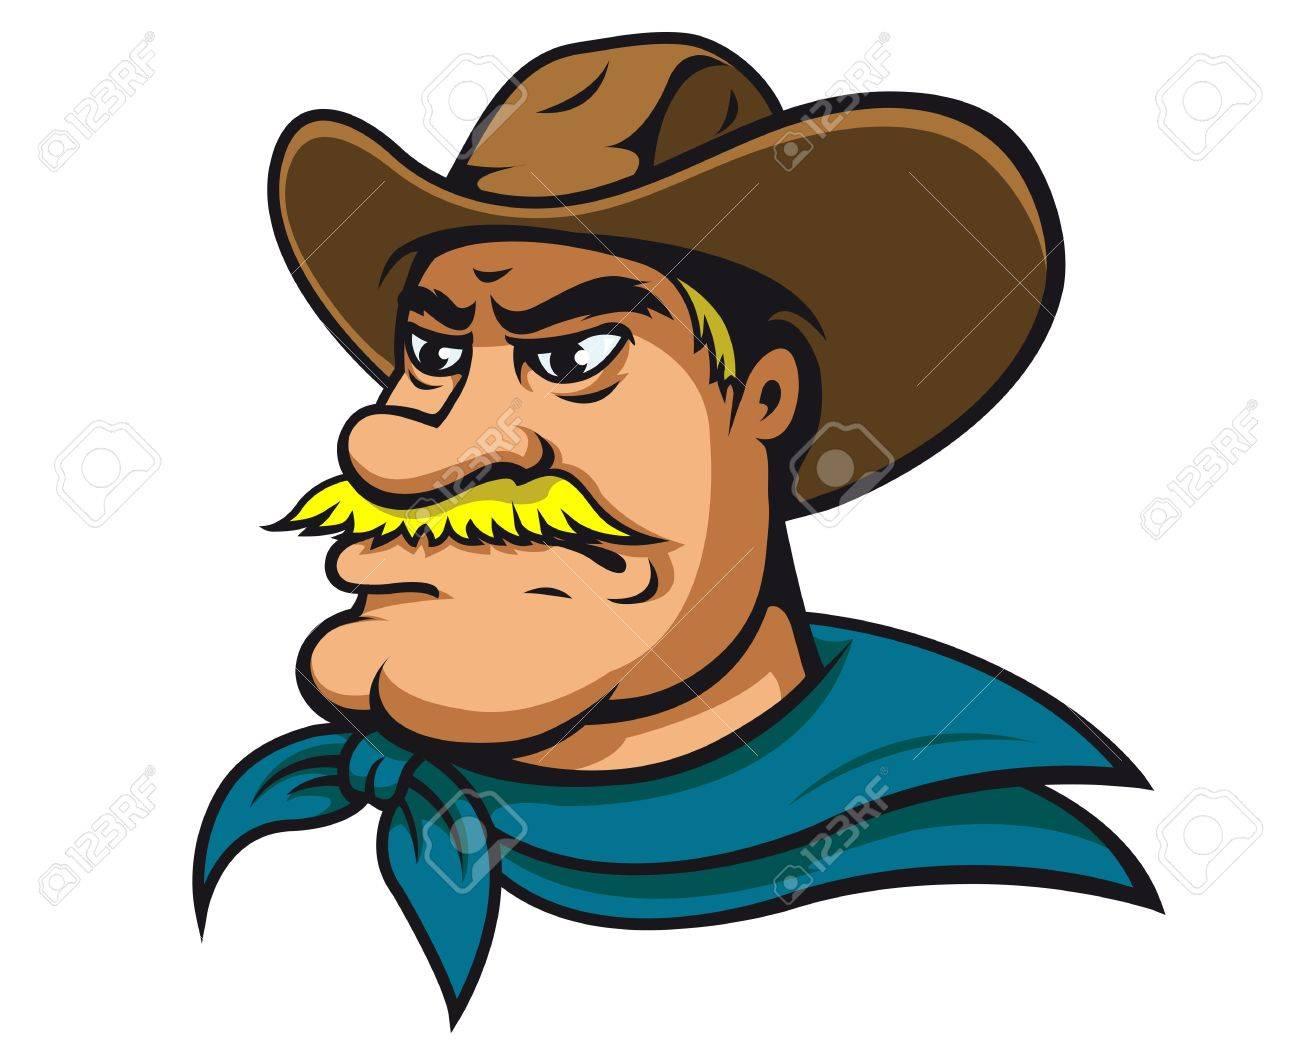 Sheriff in Cartoon Style